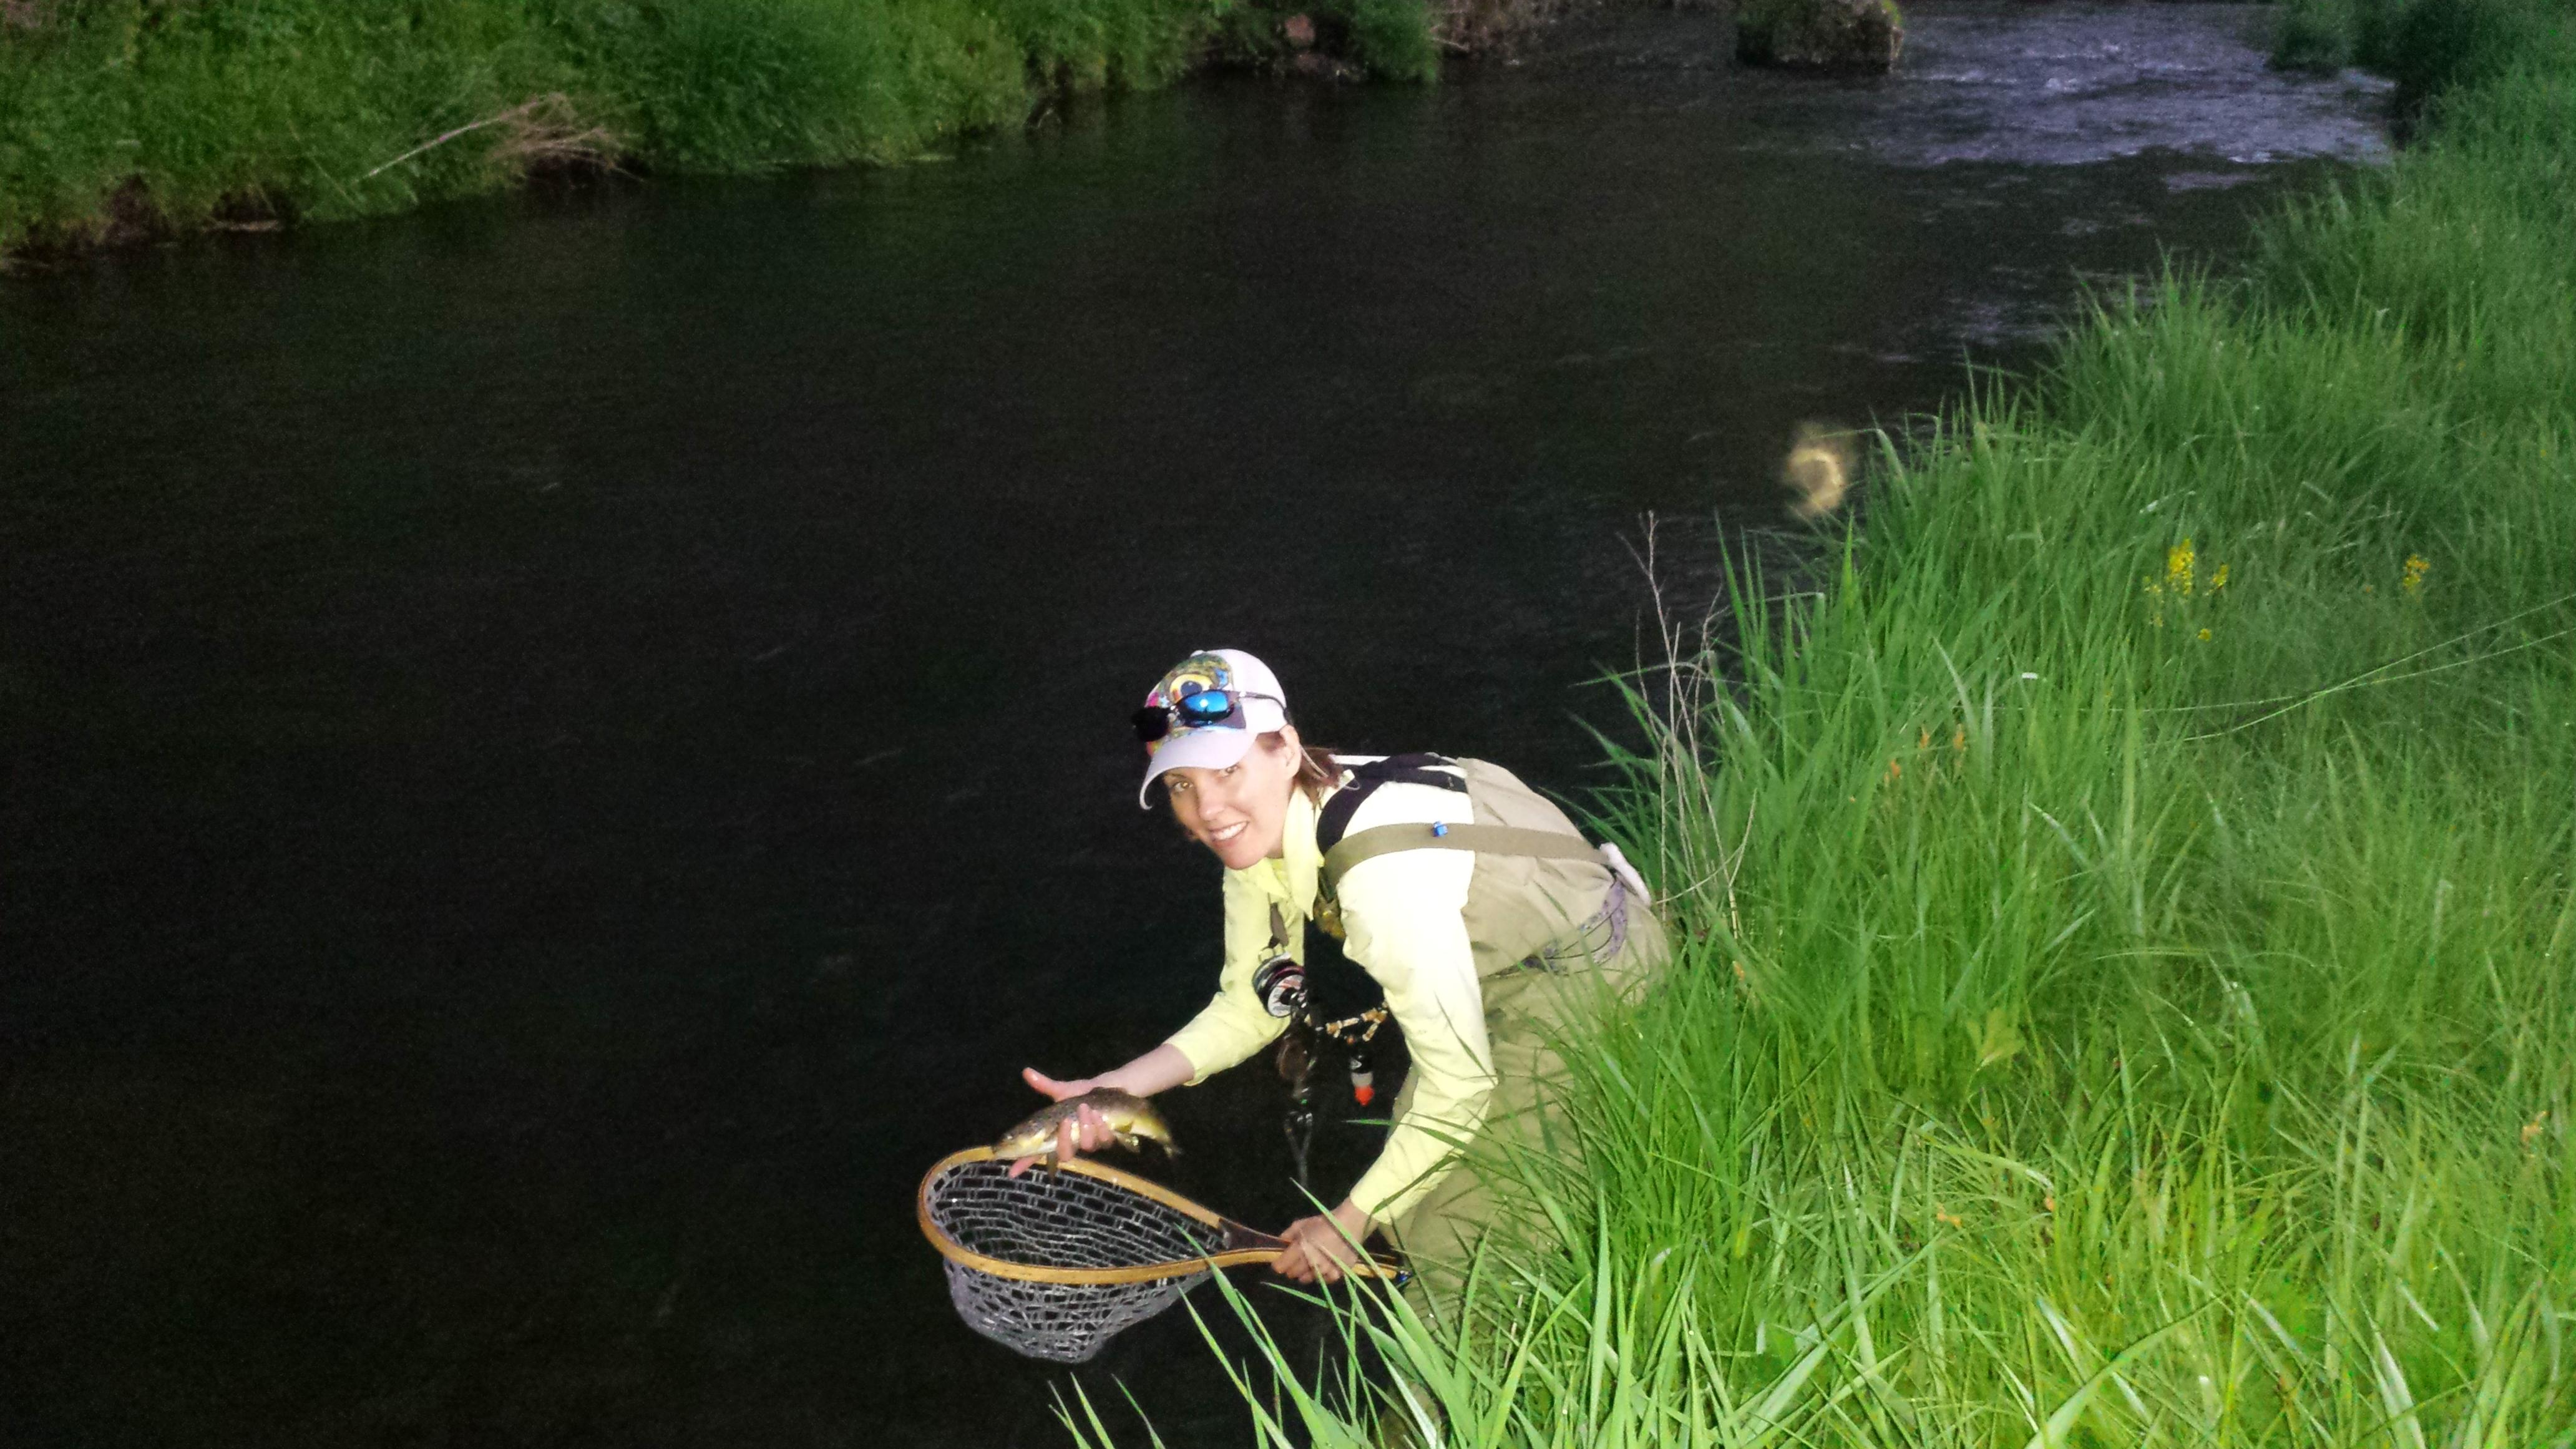 Fishing til dark71317 - Photo Gallery - Driftless Fishers